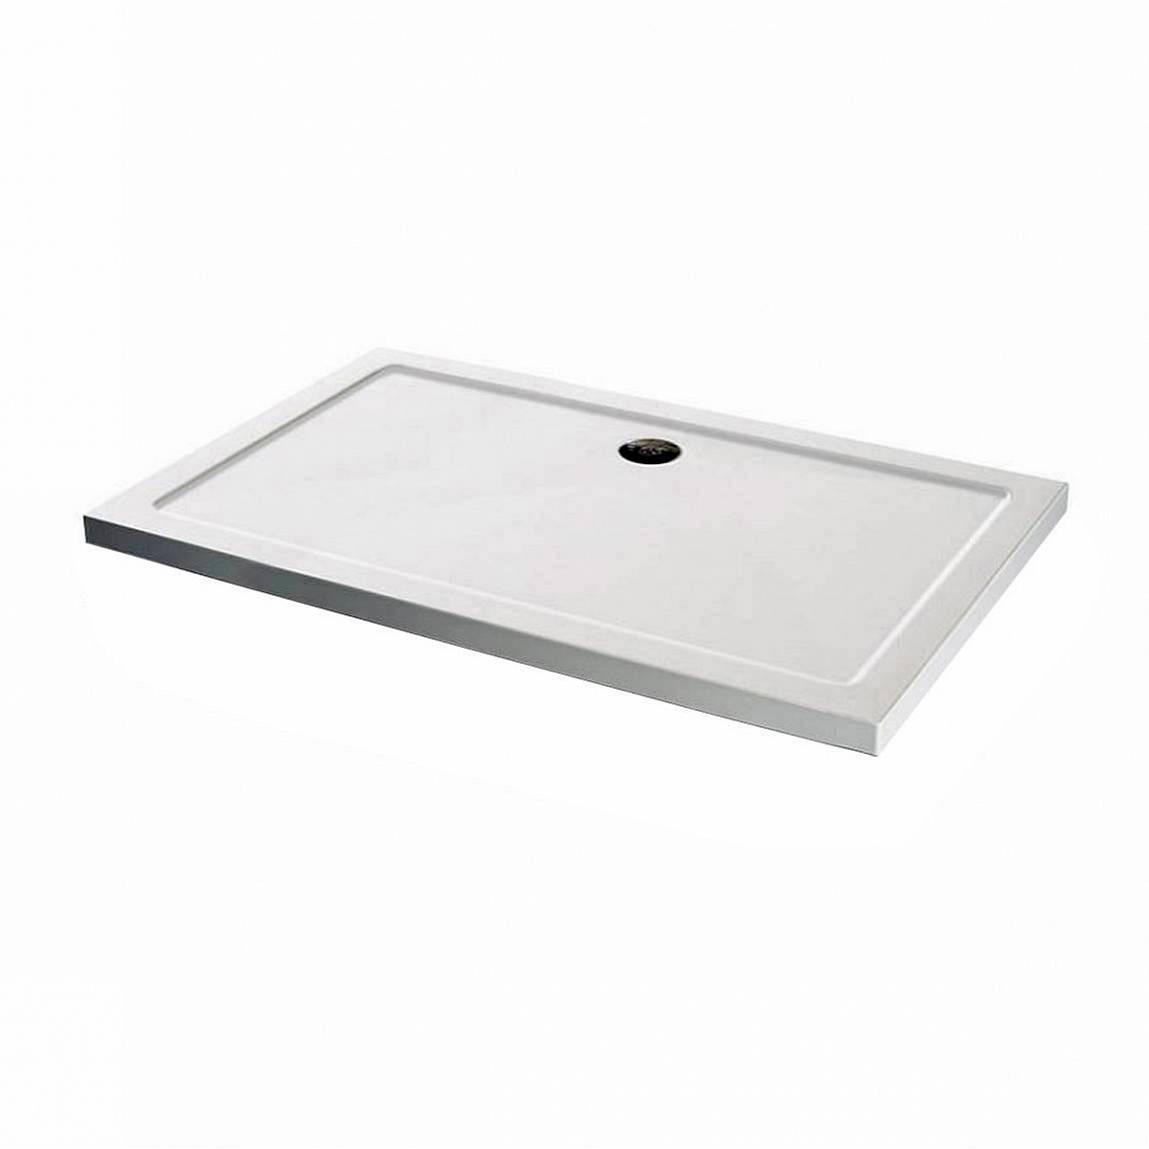 Image of Rectangular Stone Shower Tray 800 x 700